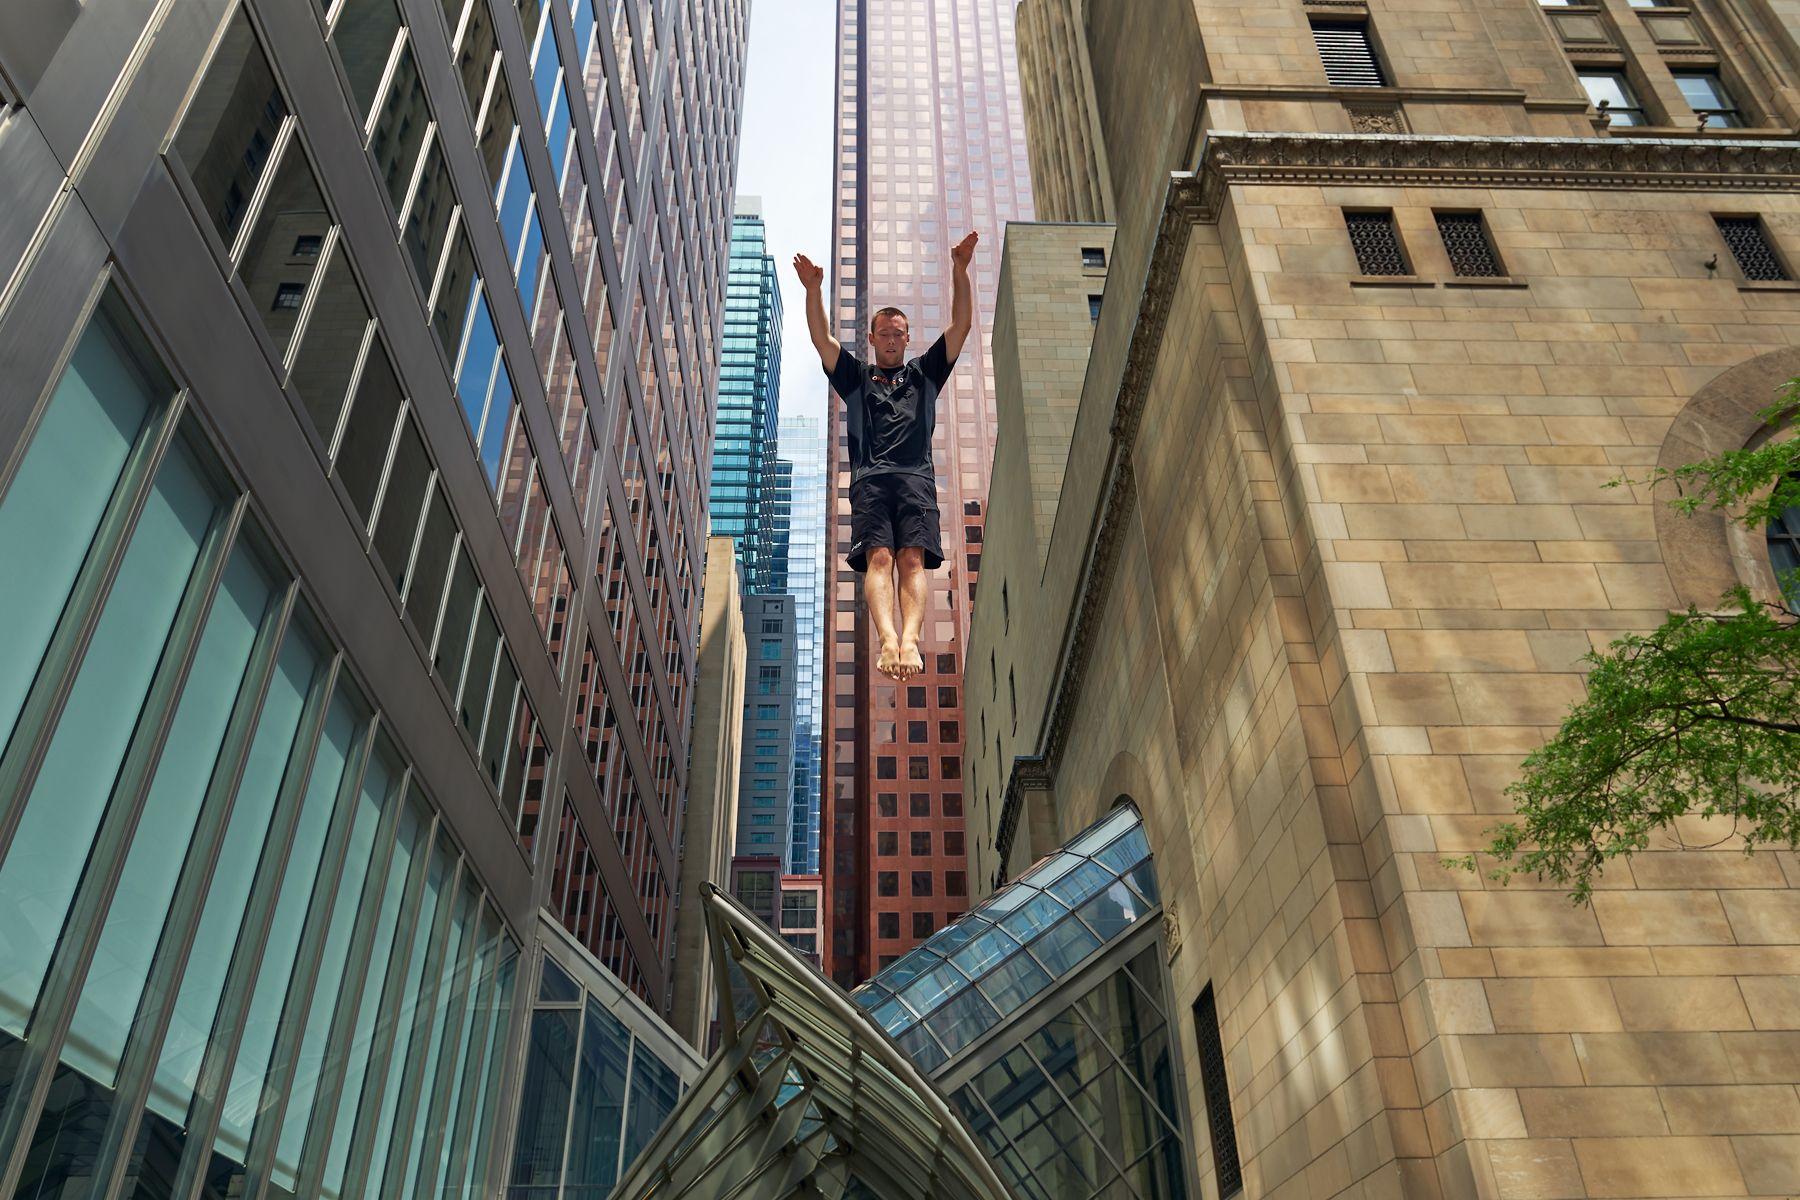 Olympic-Silver-medalist-Jason-Burnett-trampoline.jpg